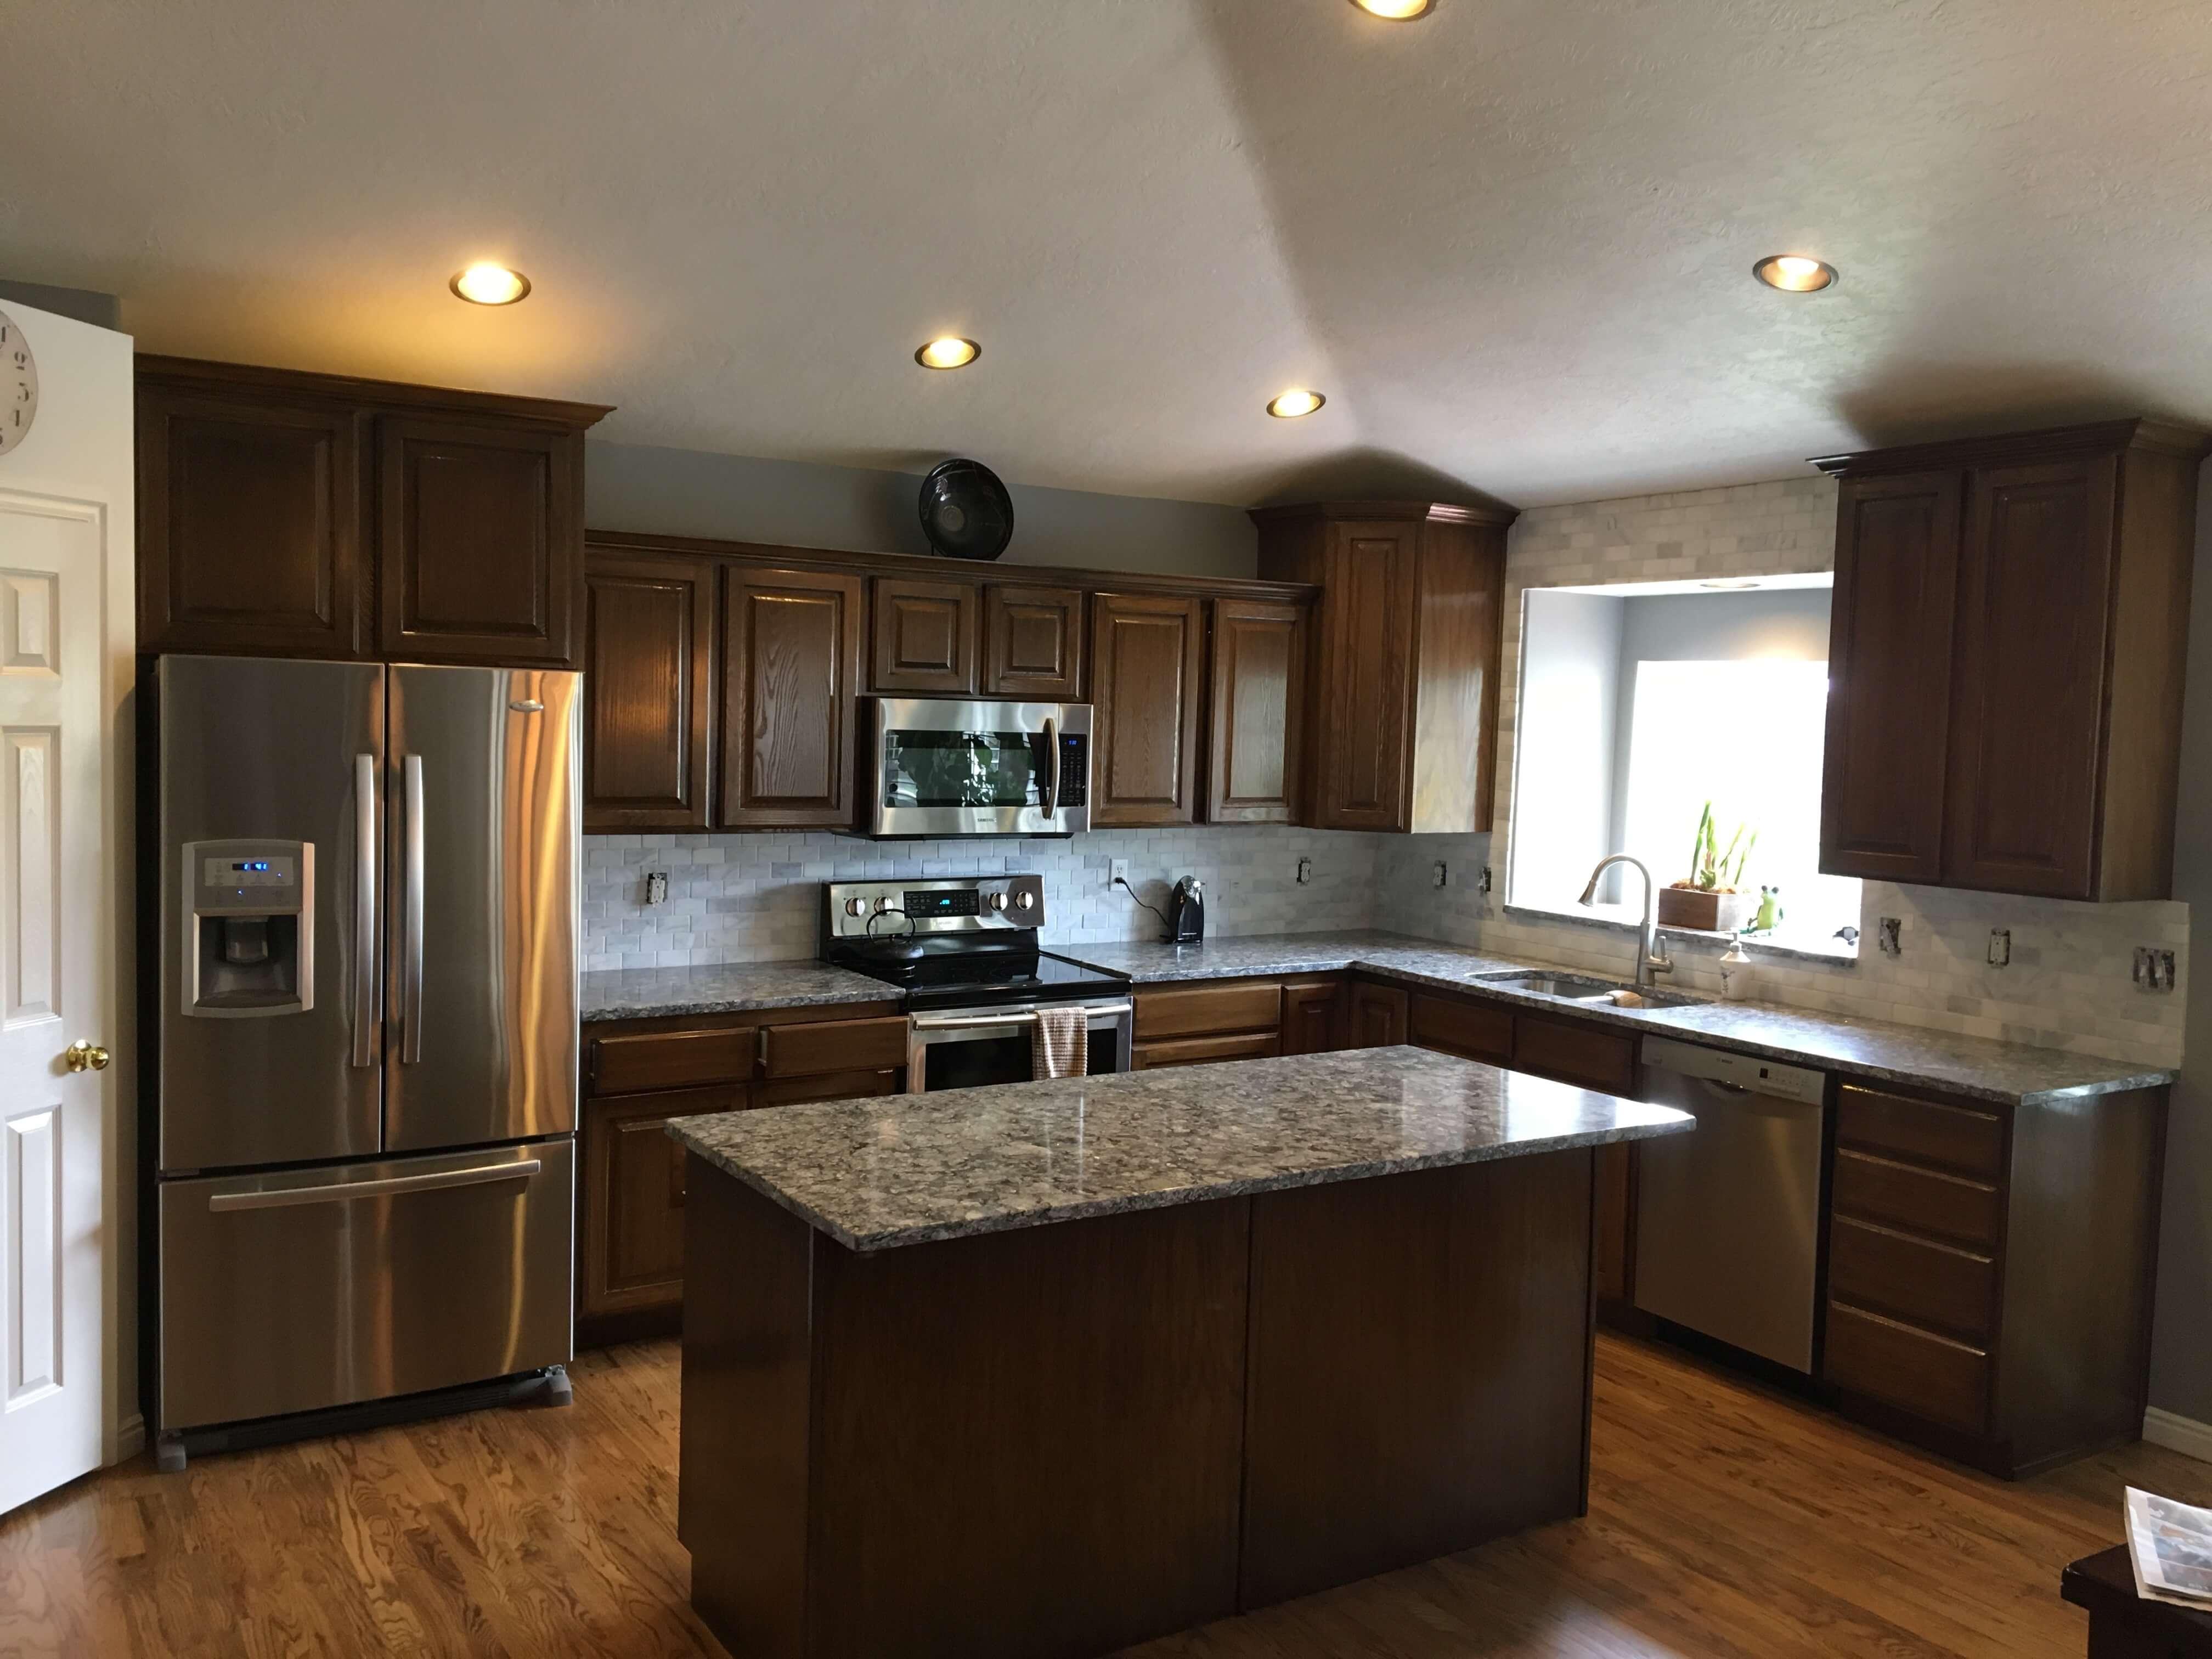 Sensational Woodworks Refurbishing Cabinet Refinishing Salt Lake City Ut Home Interior And Landscaping Oversignezvosmurscom